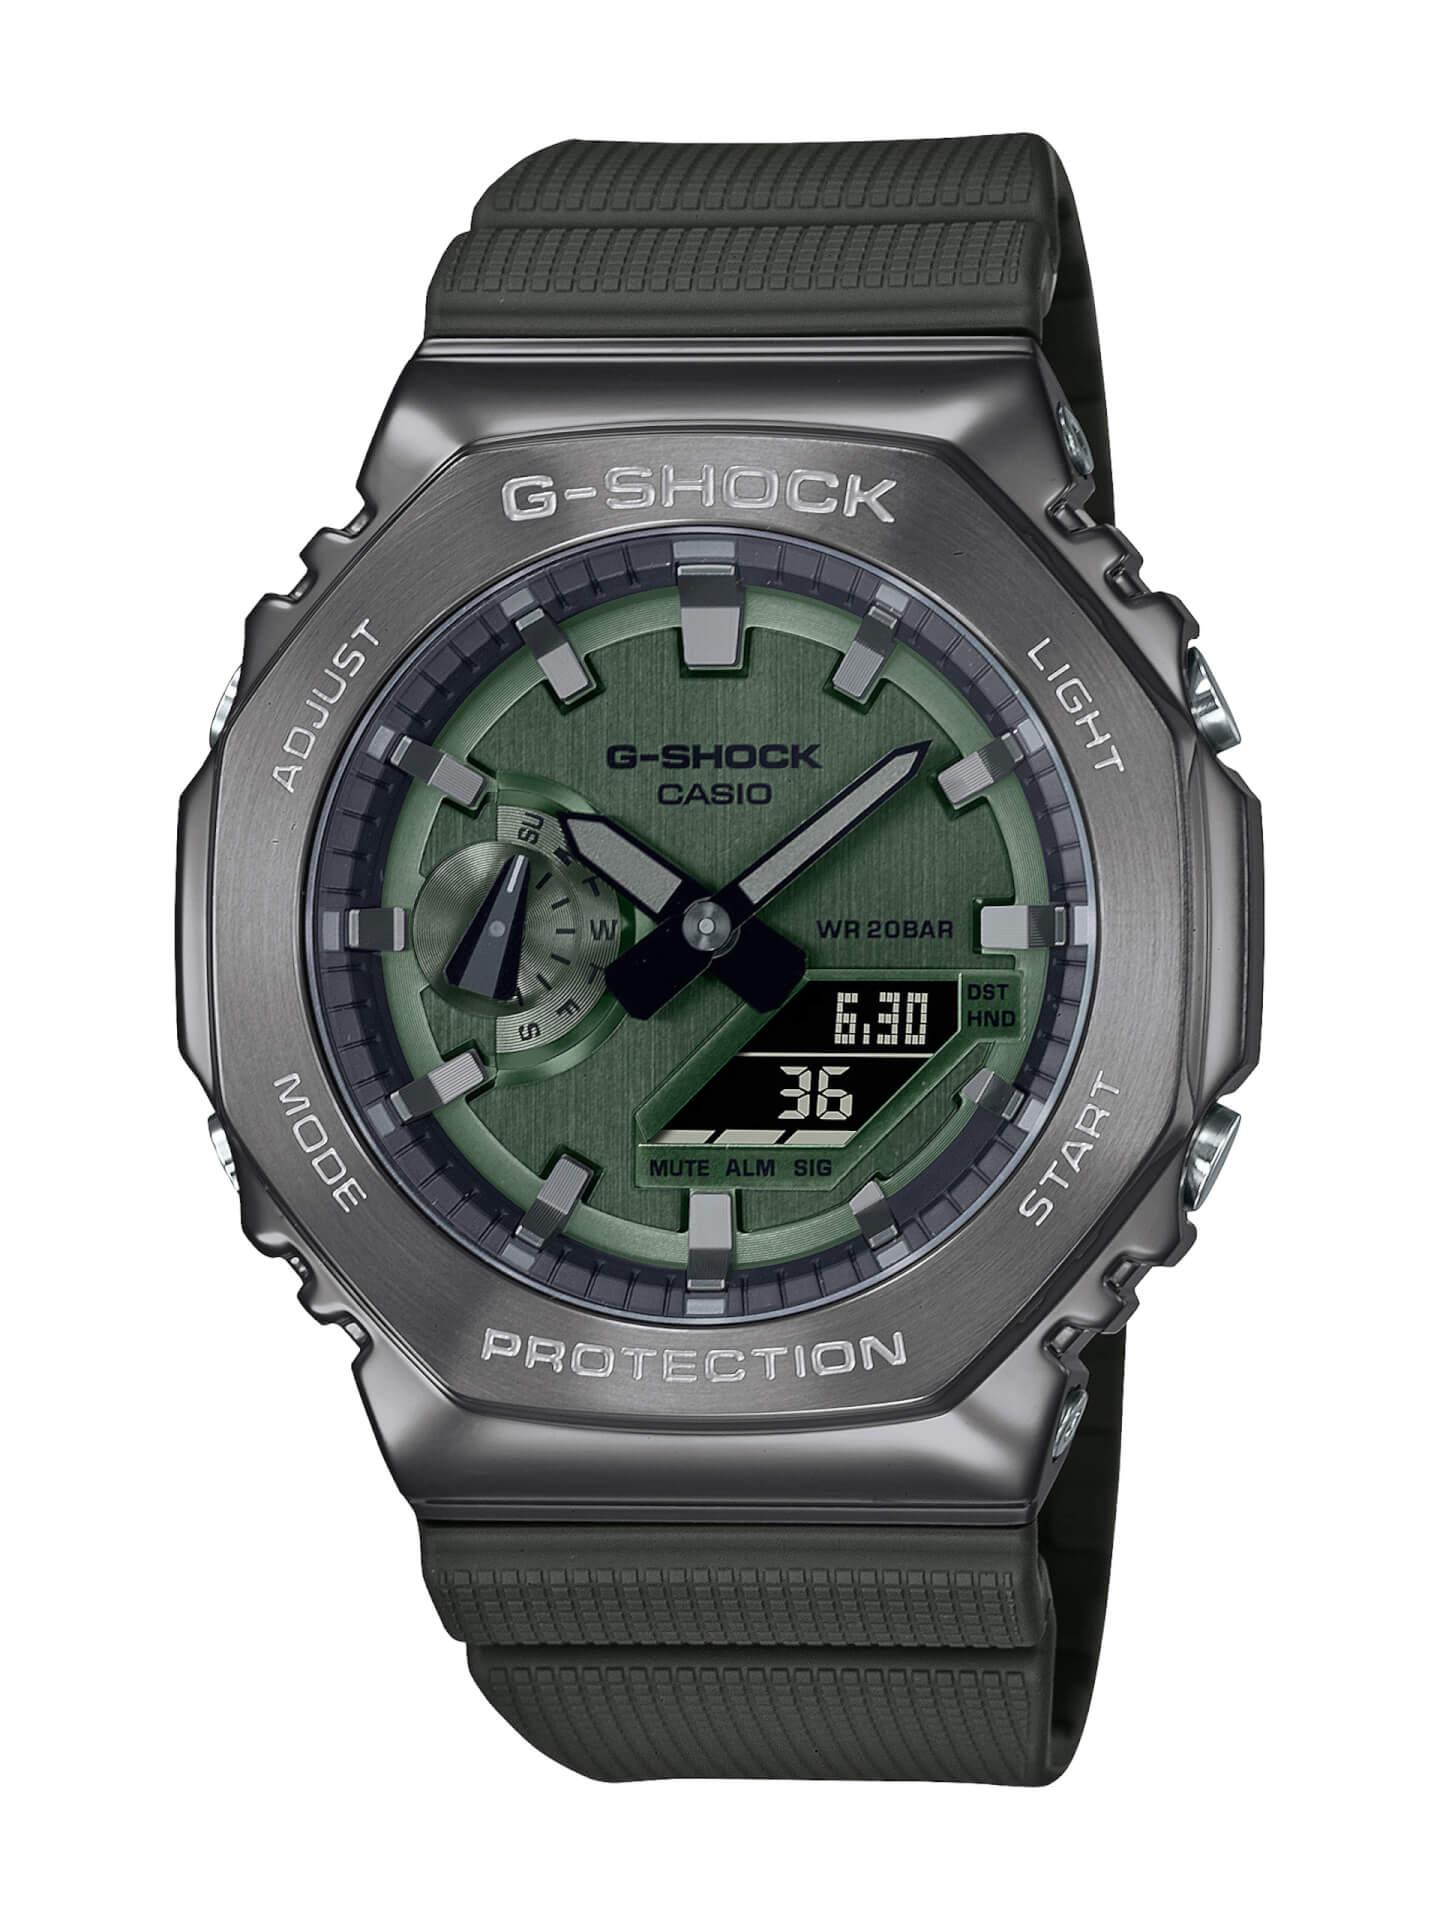 G-SHOCKにメタルベゼルを採用した新モデル2種が登場!『GM-2100』&『GM-S2100』が発売決定 tech210715_gshock_metal_5